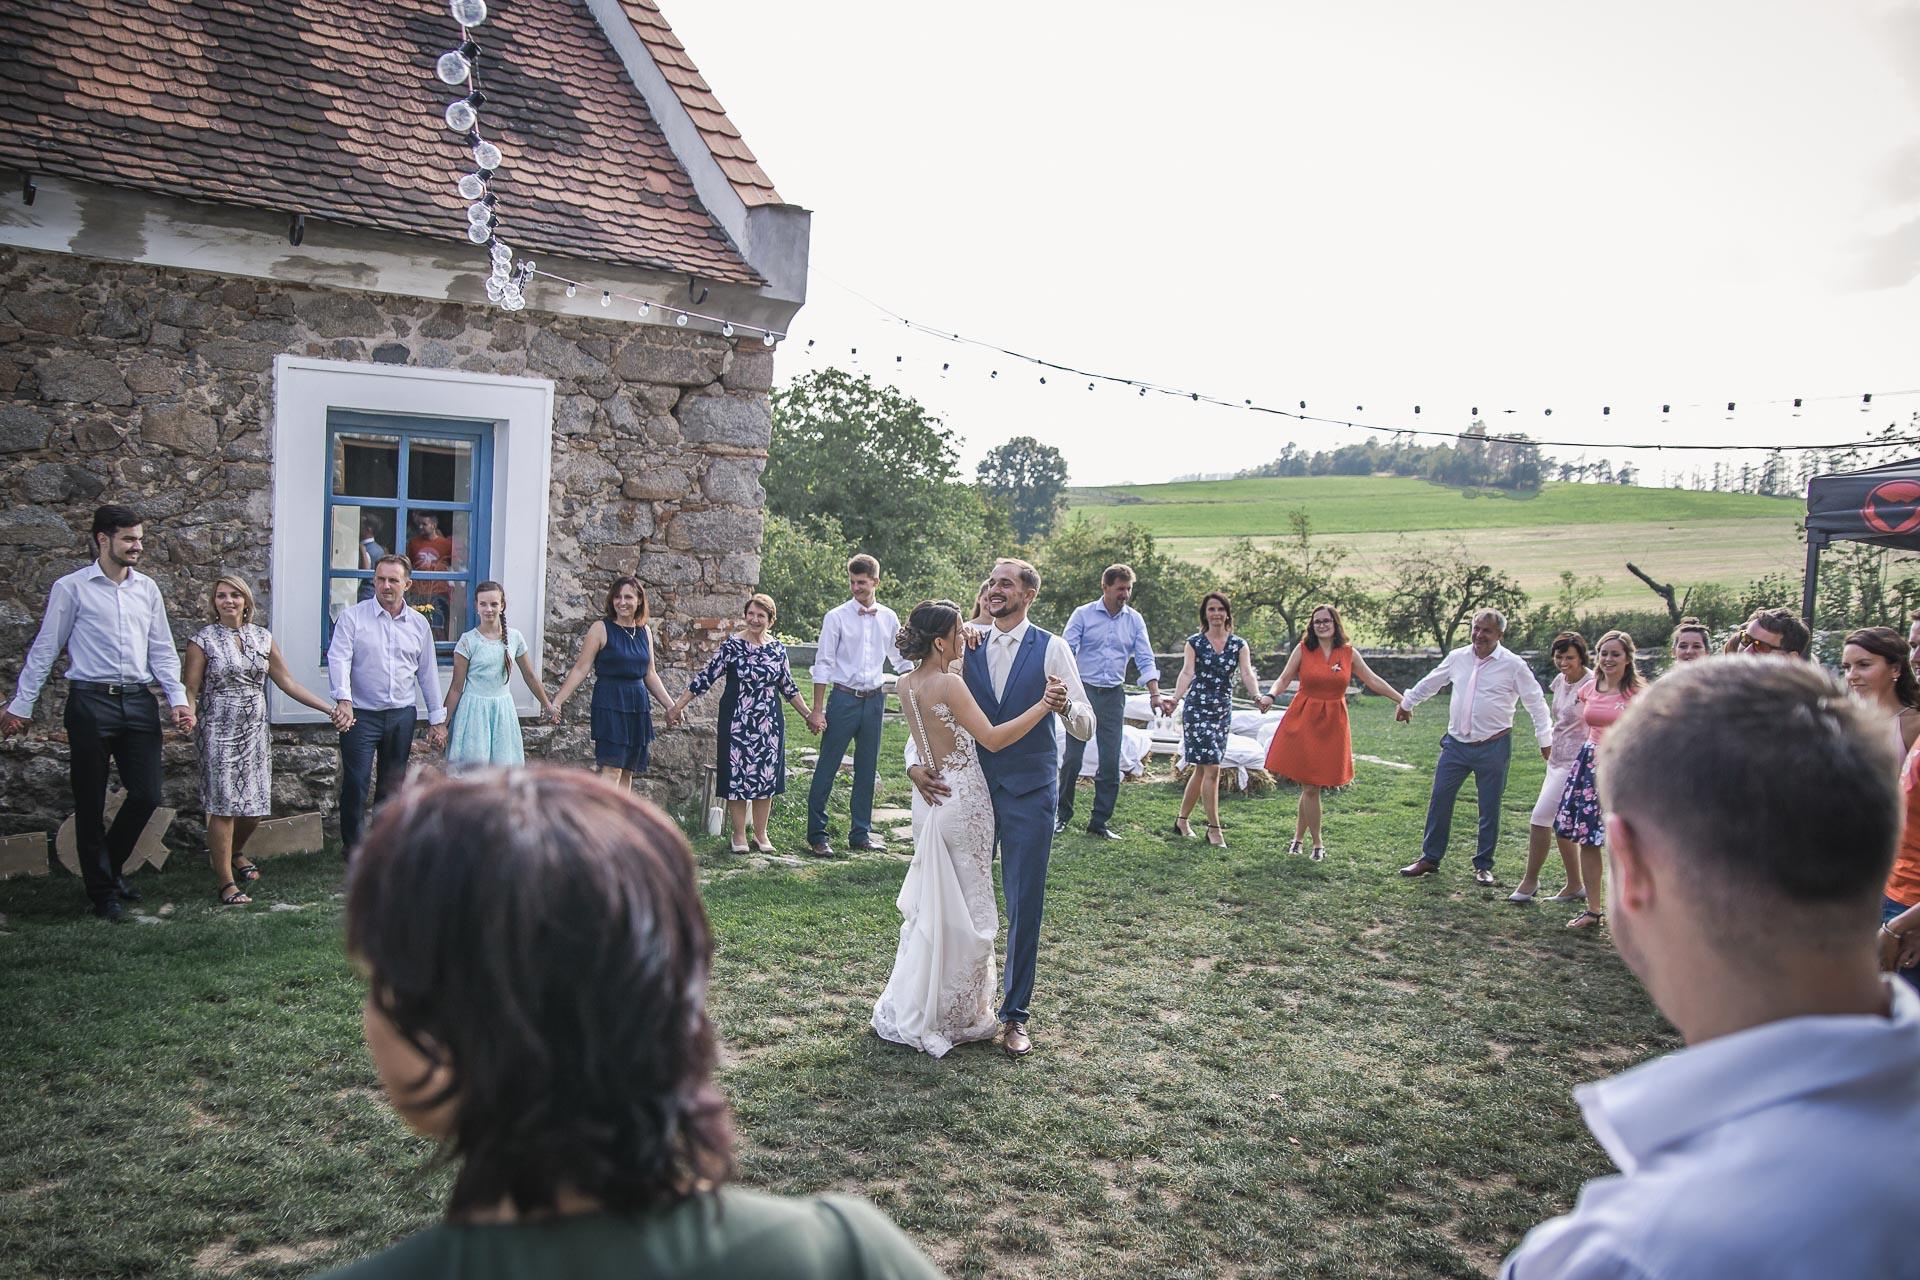 svatební-fotograf-wedding-svatebni-video-orlík-vltava-kostel-statek-stodola-boho-svatba-Beautyfoto-442